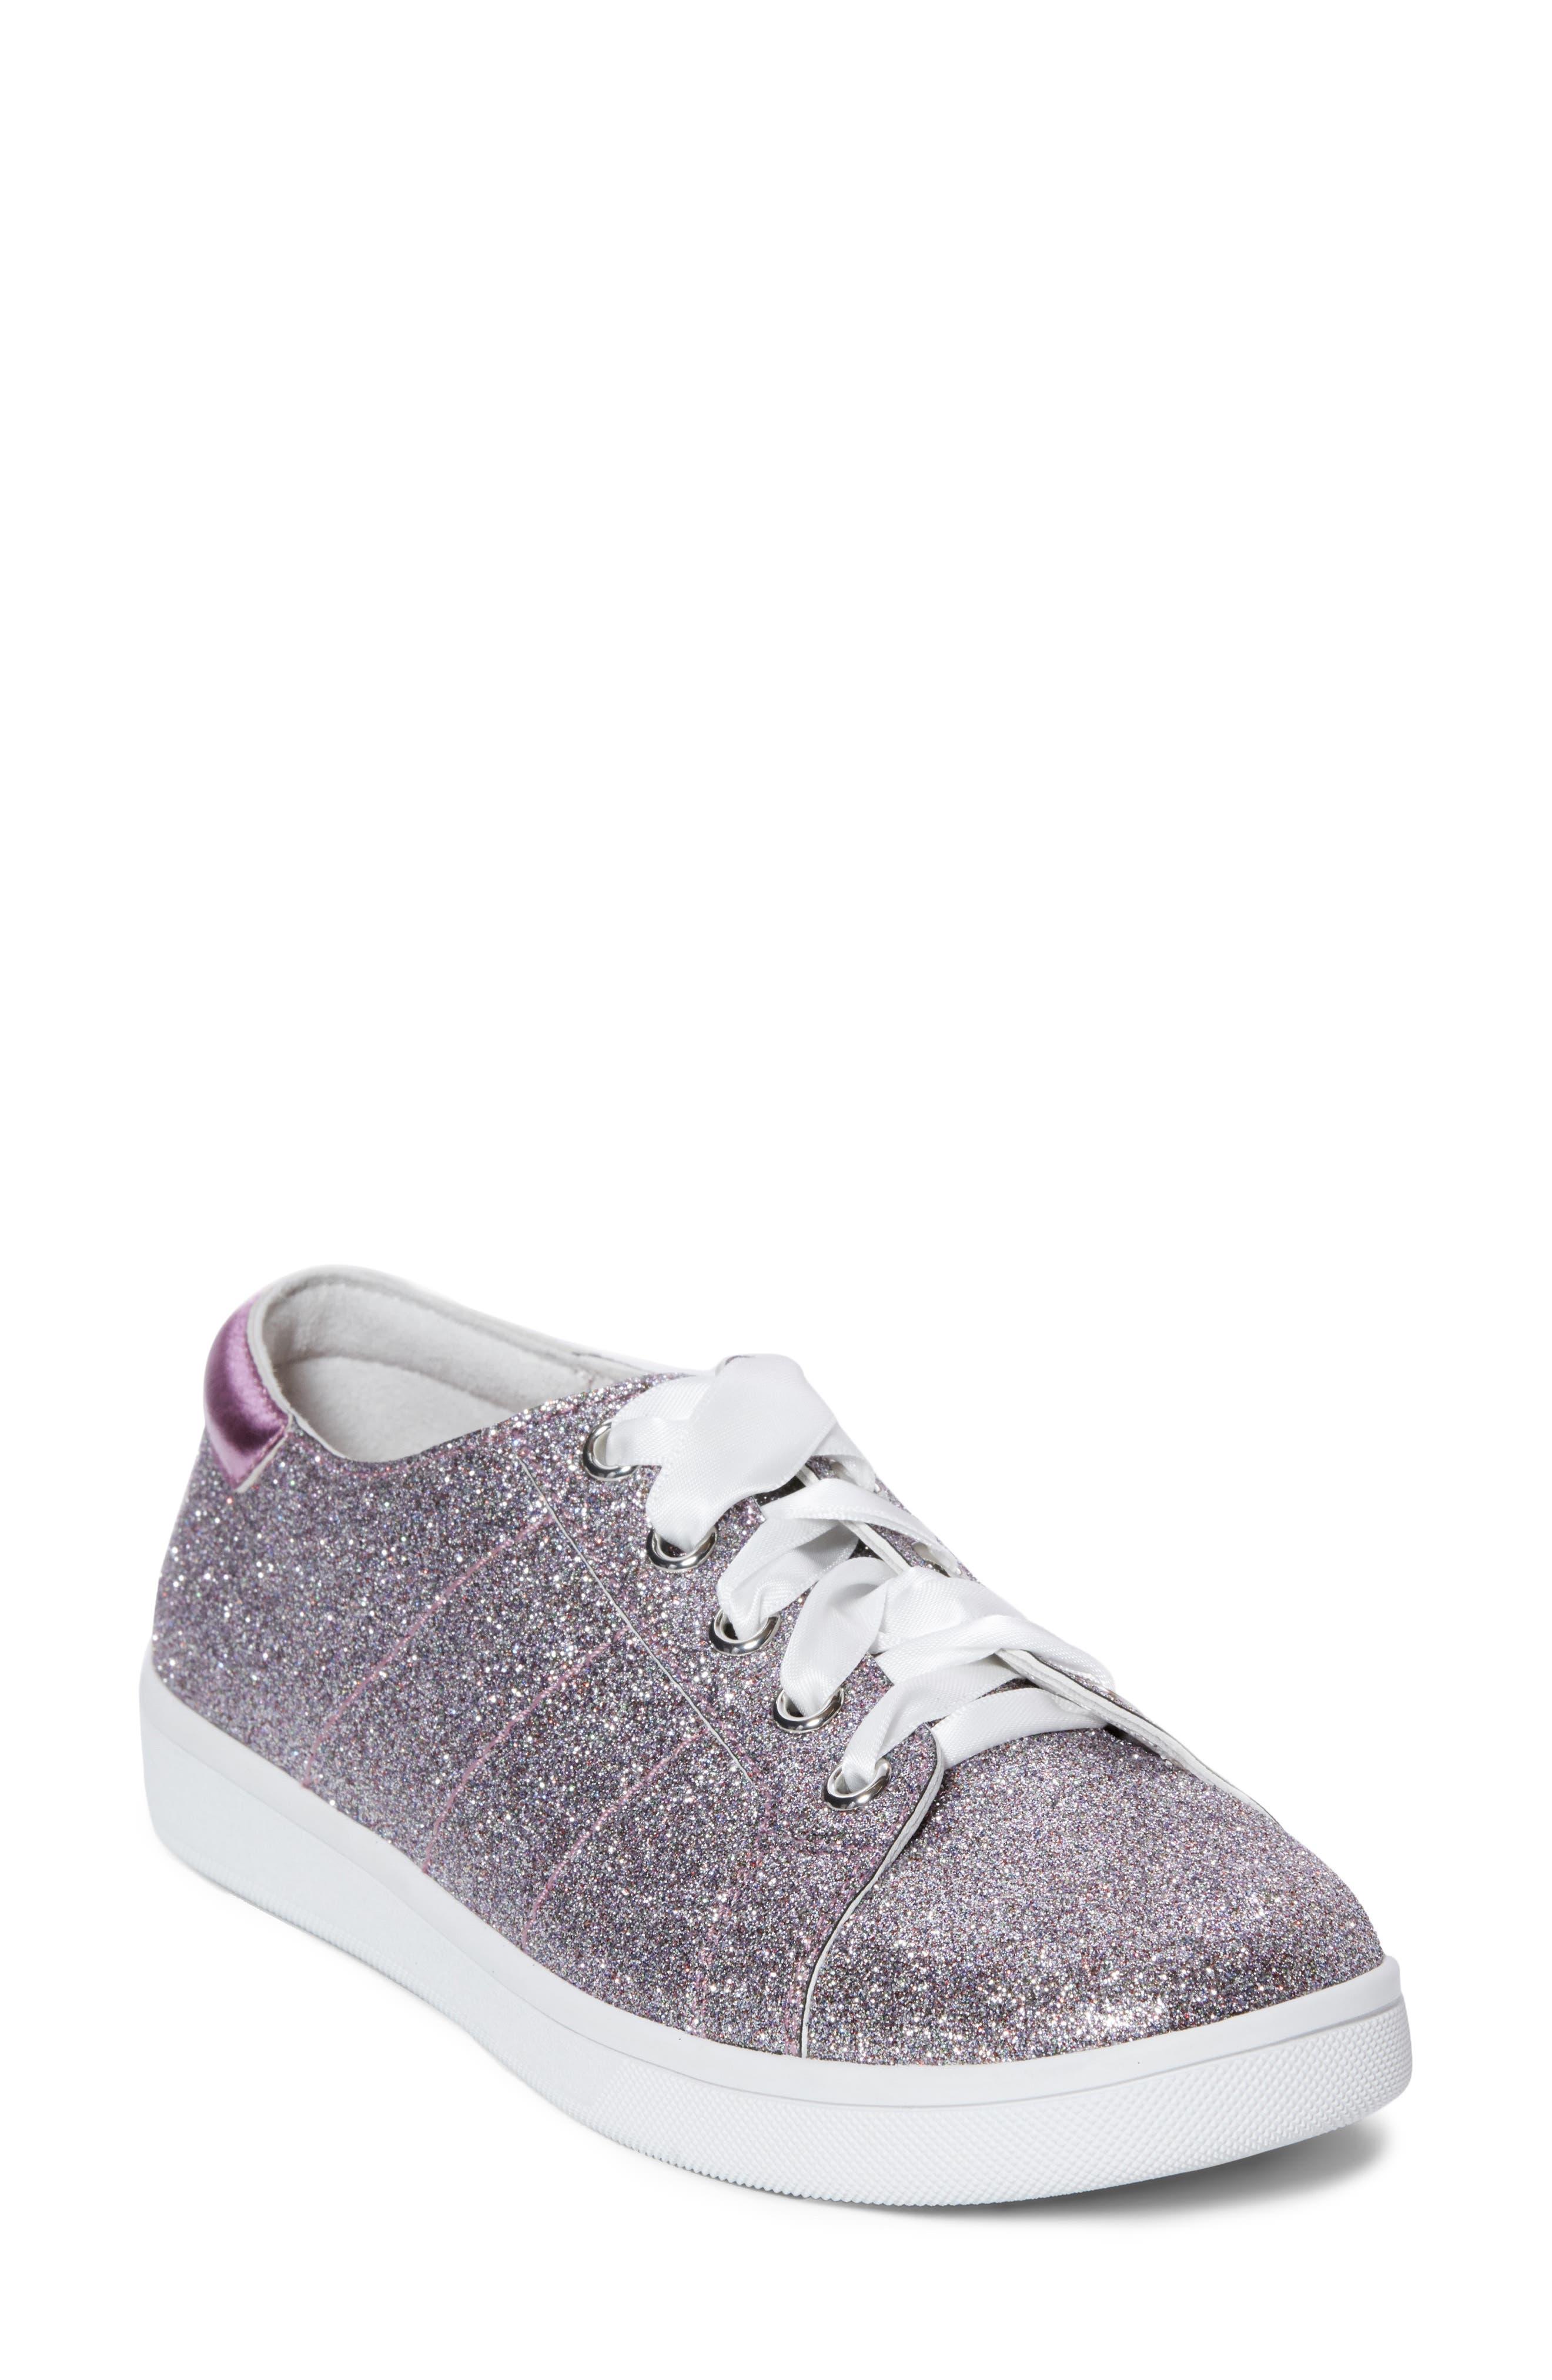 Image of PAIGE Alesia Glitter Sneaker